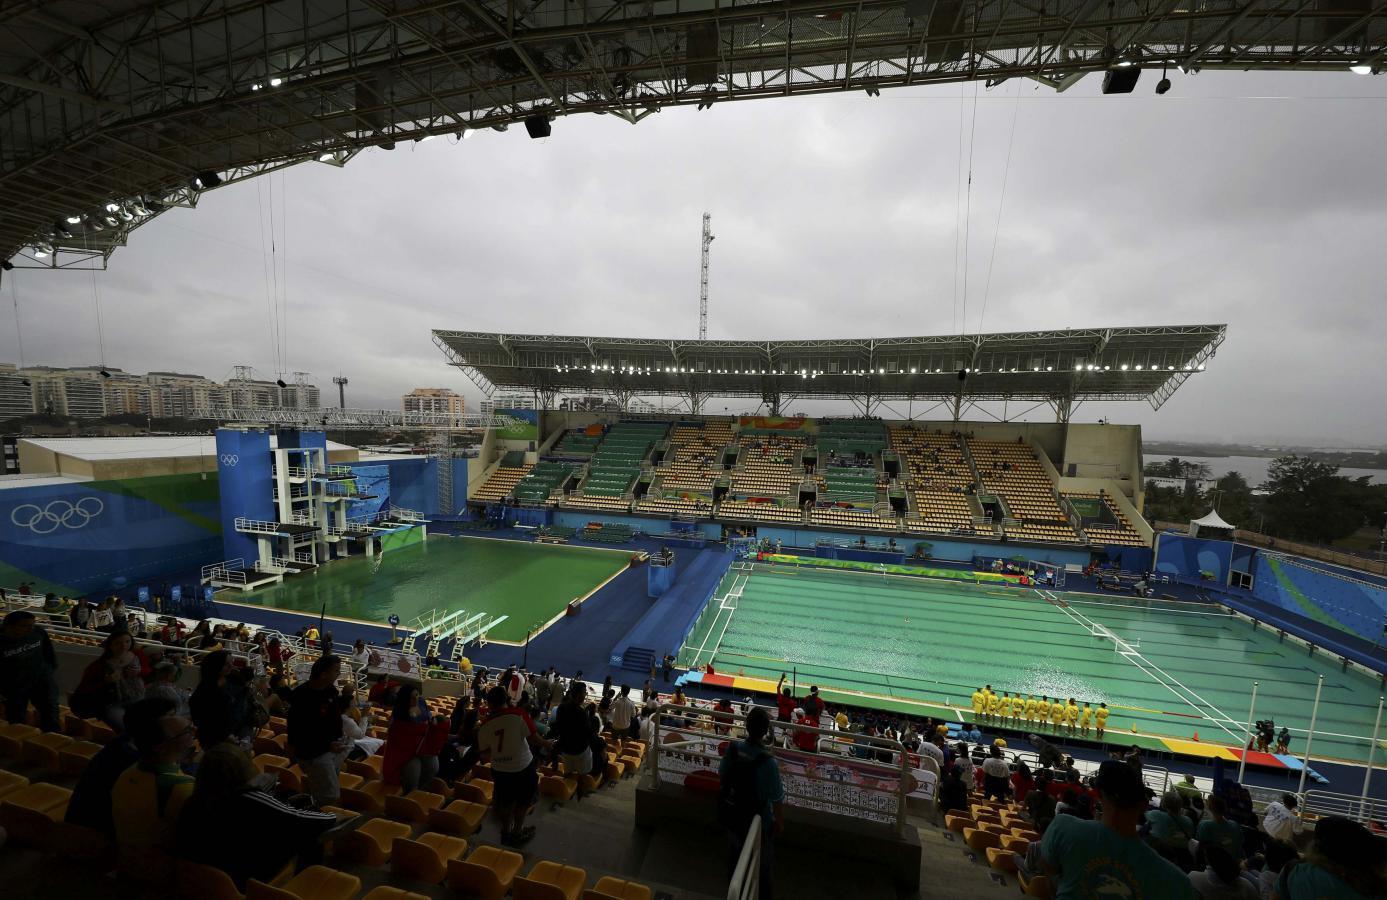 Olympics: Drop in alkalinity to blame for green pool - Rio organisers : poolkemikalier : Inredning